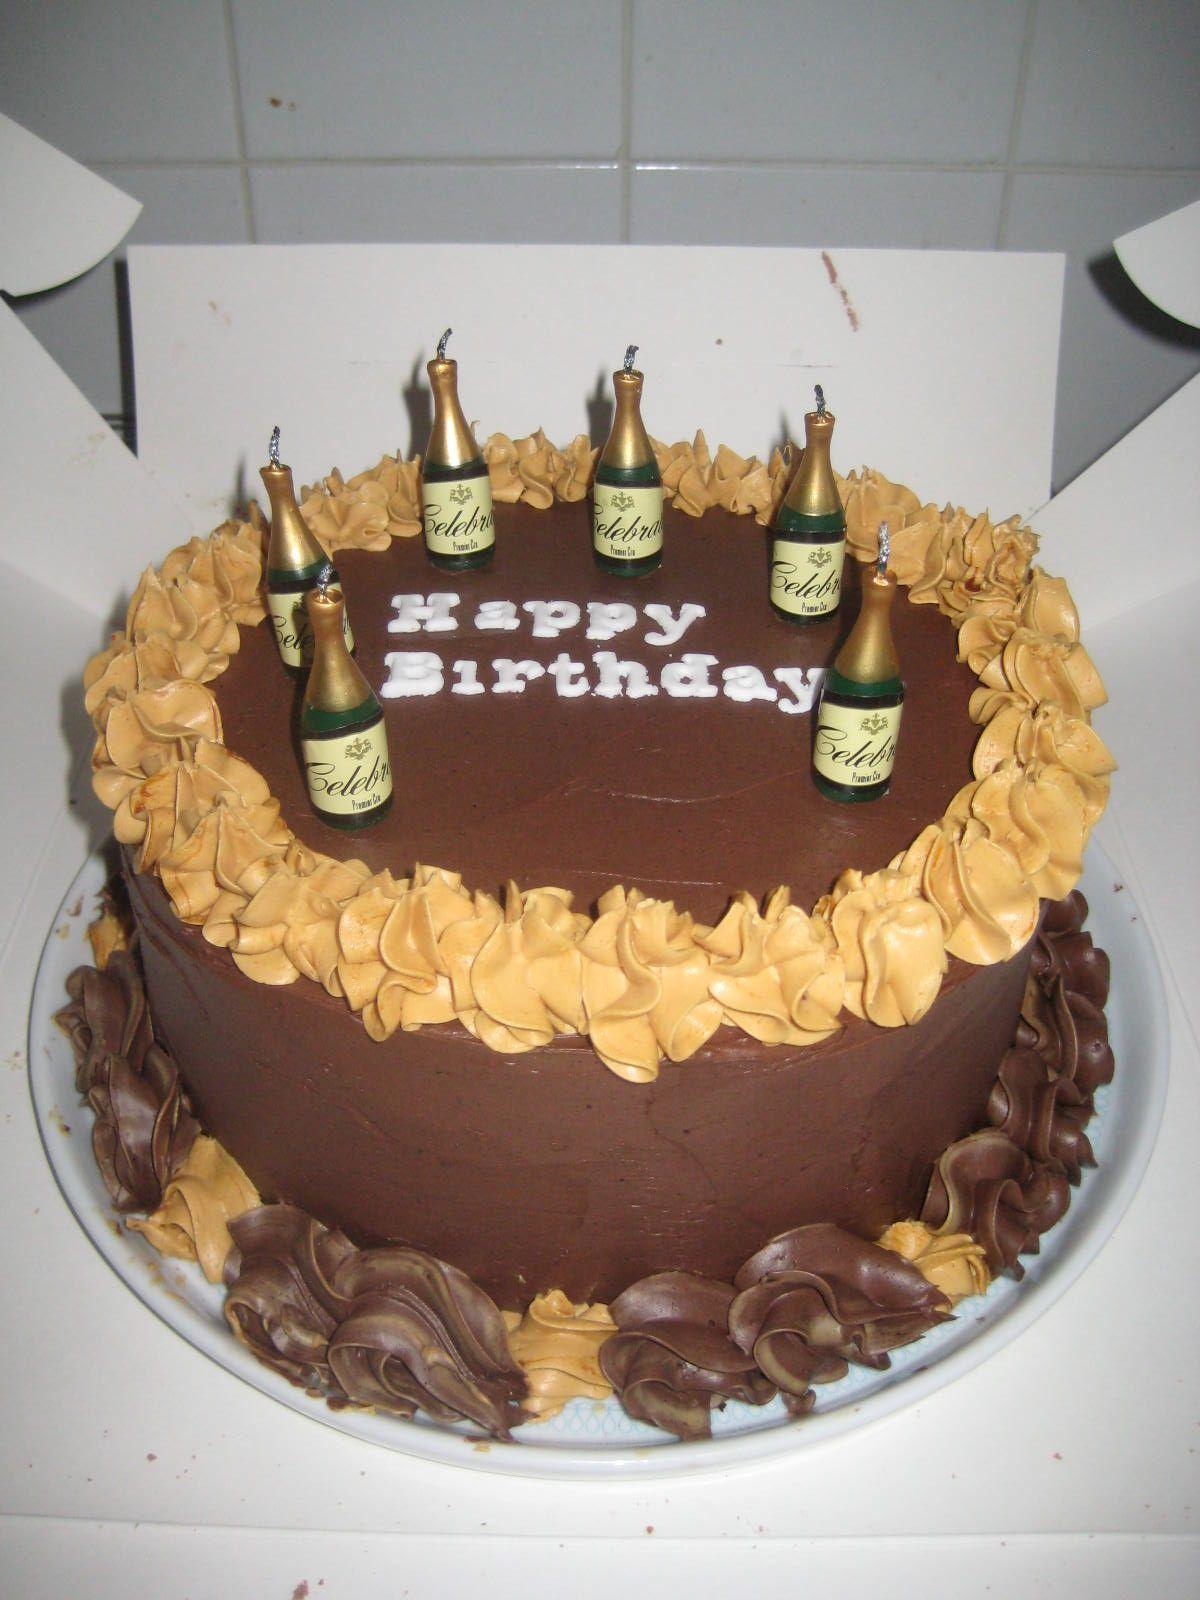 Chocolate Fudge And Caramel Cake Made For My Fiances Birthday